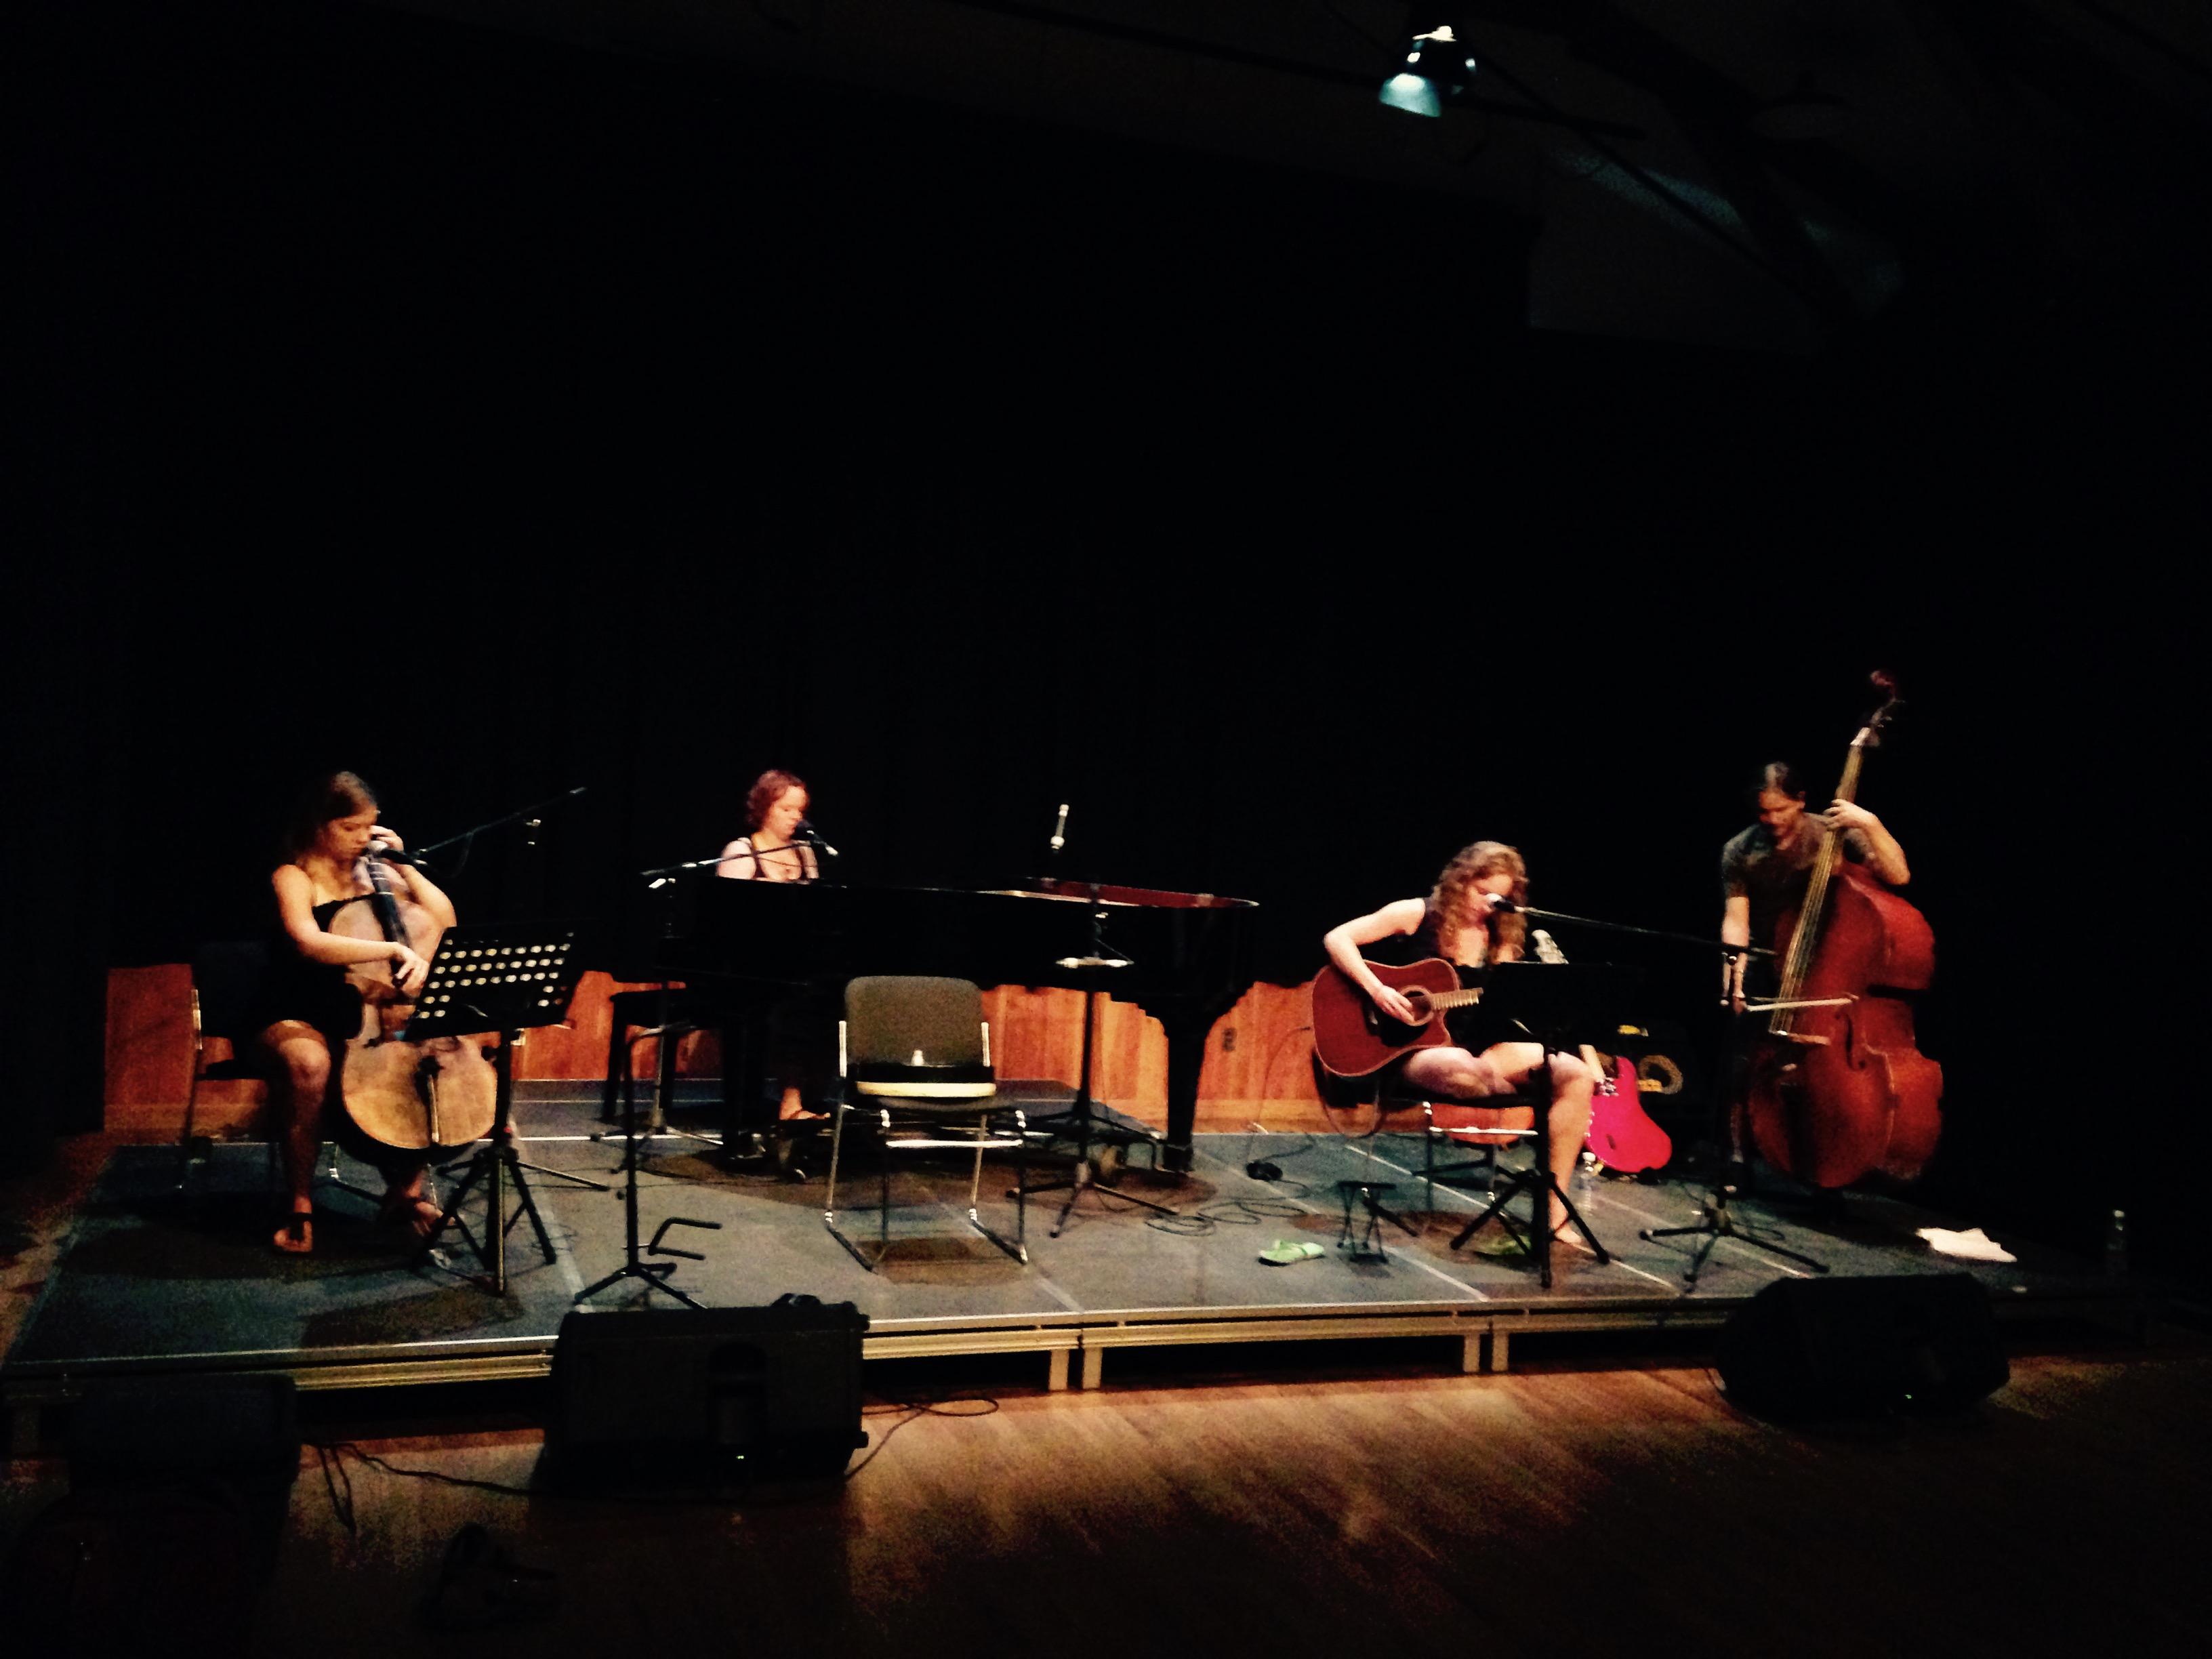 Allison Crowe, Billie Woods, Celine Greb, Dave Baird - Summer 2015 soundcheck